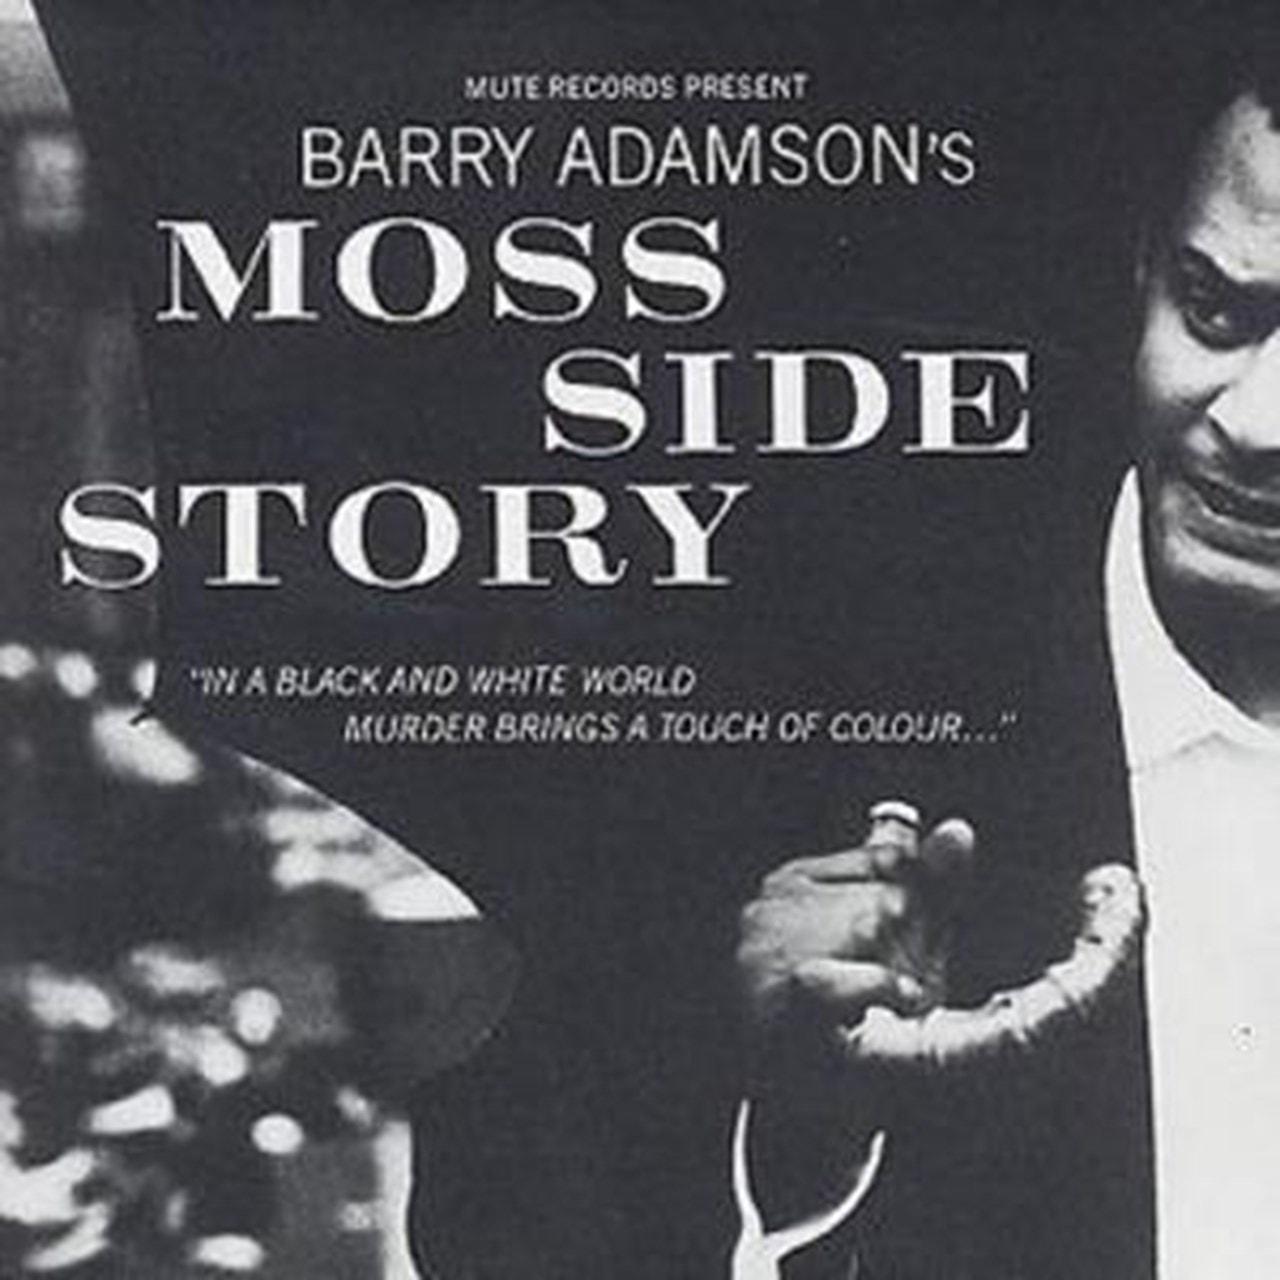 Moss Side Story - 1